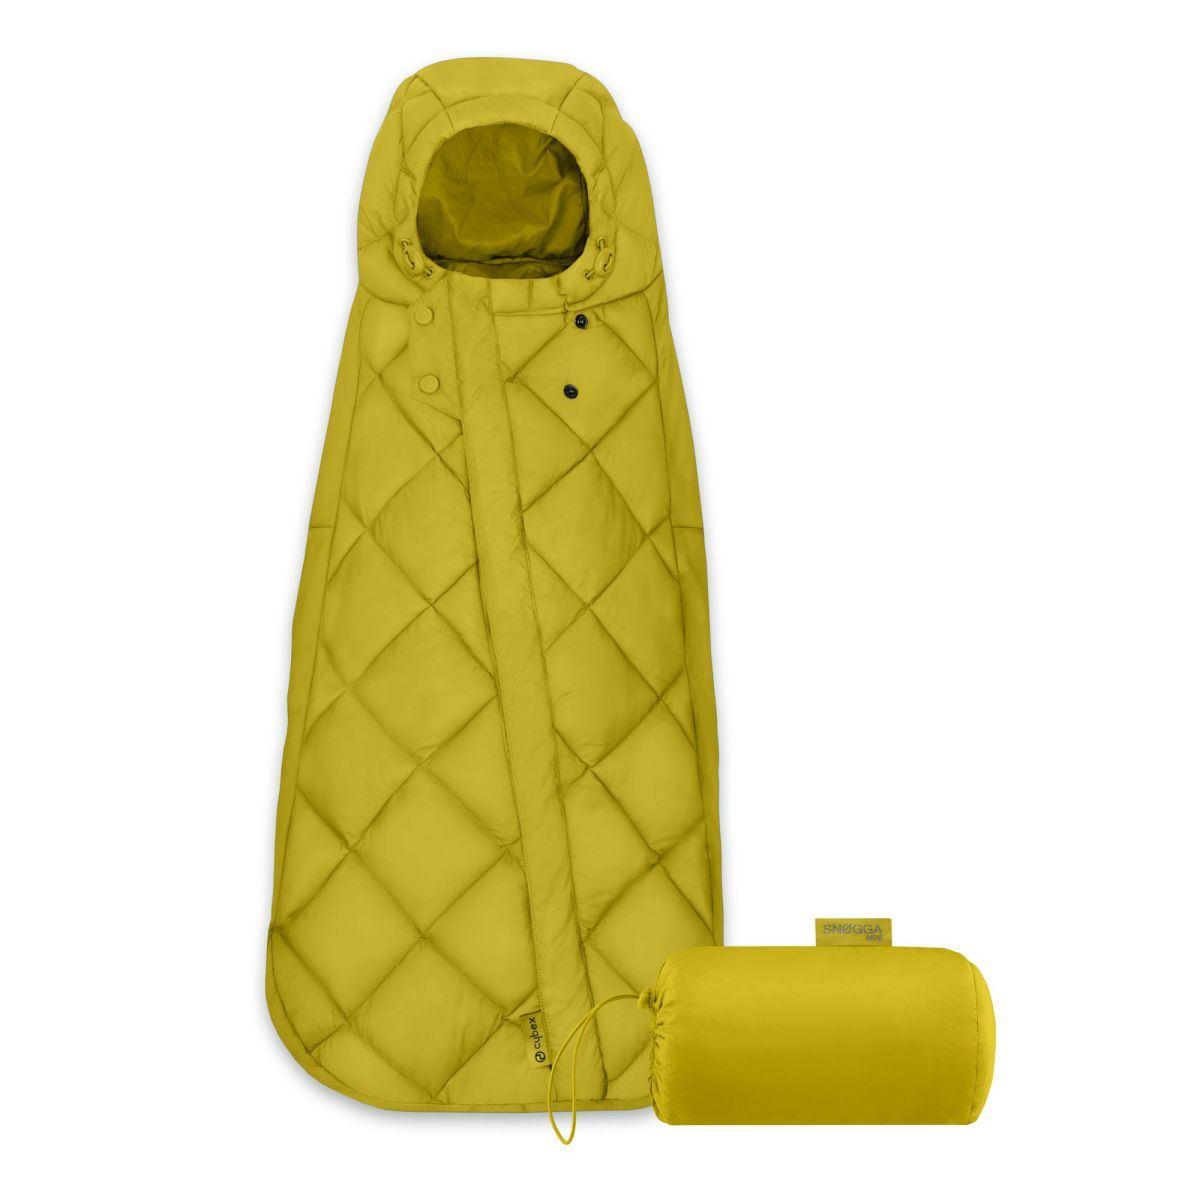 Saco Cybex snogga mini Mustard Yellow